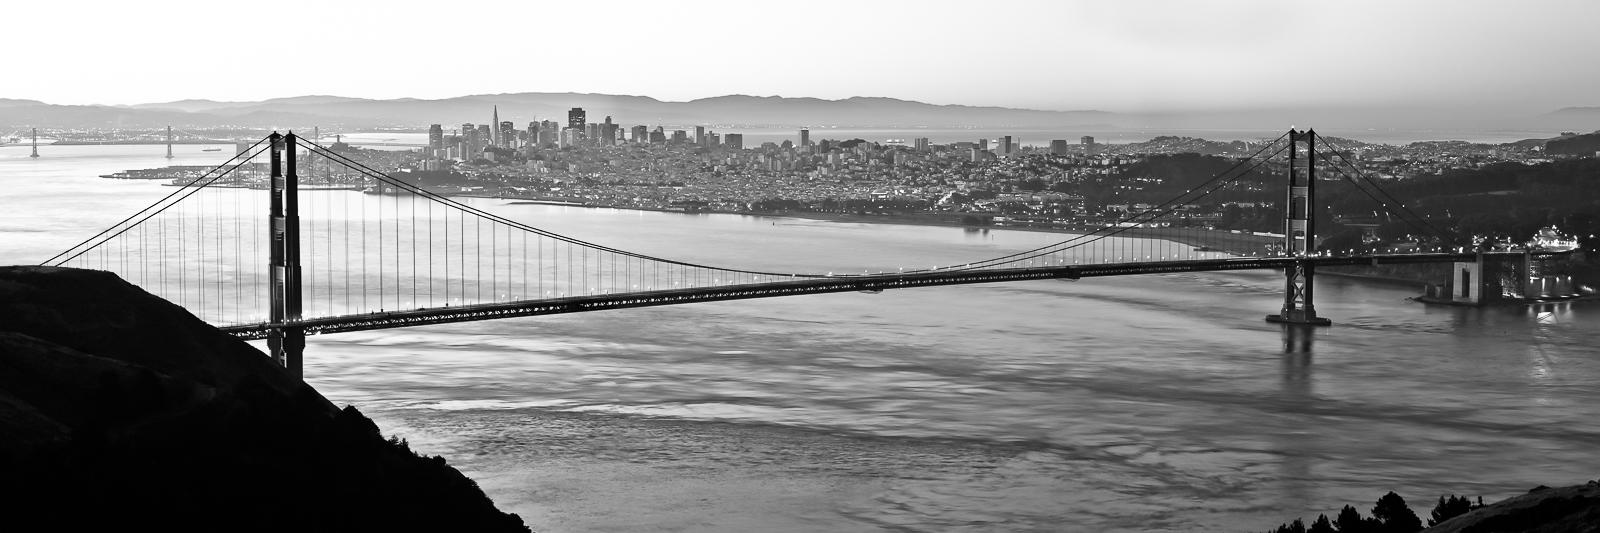 , Spanning Gates, Black and White, Bridge, California, Golden Gate Bridge, Panoramic, San Francisco, horizontal, BW, B&W, Black, White, photo